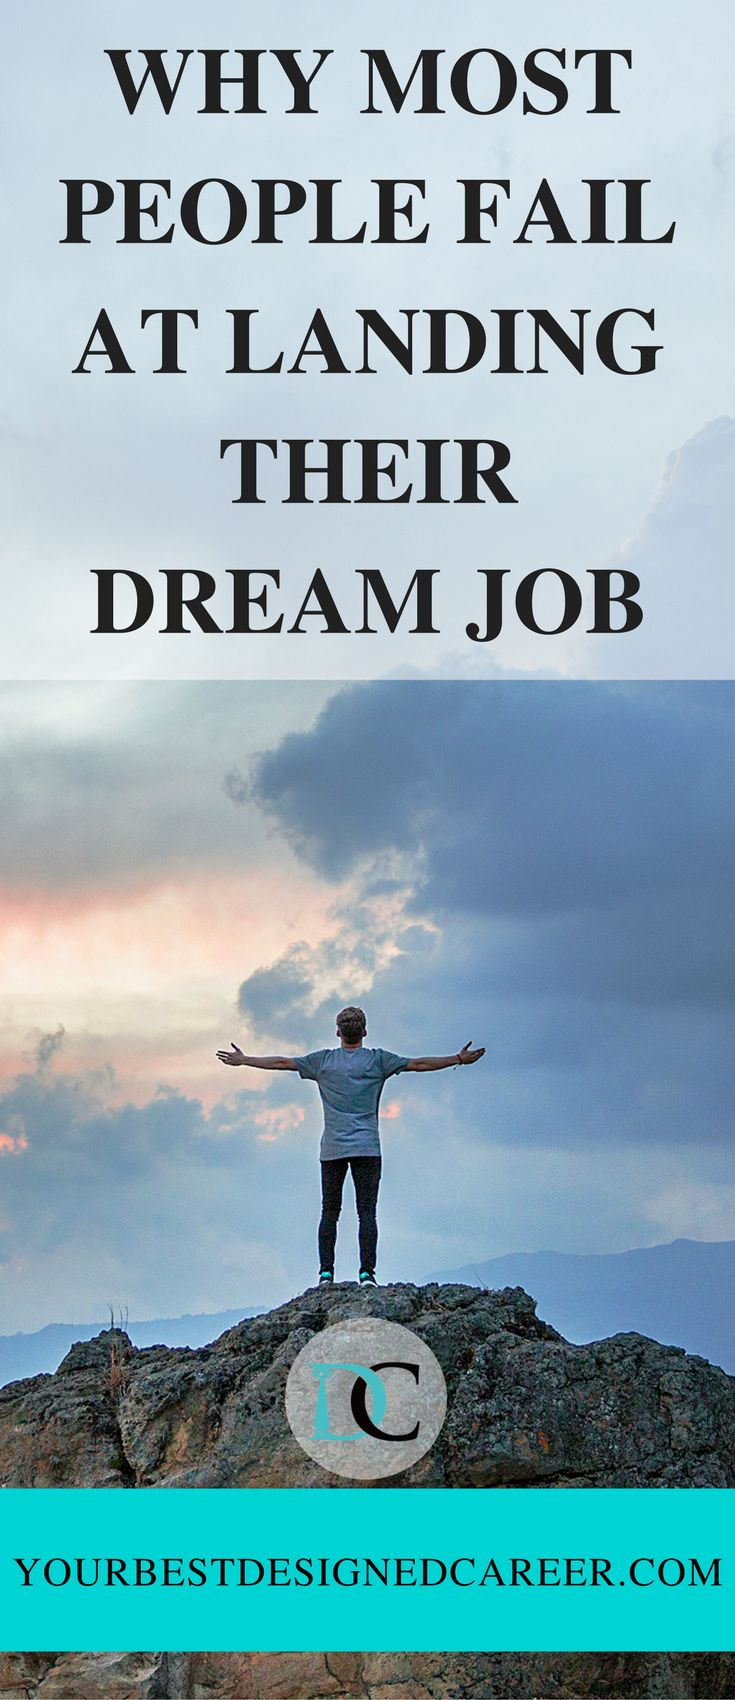 career, career advice, dream job, dream, career change, job change, career development, inspiration